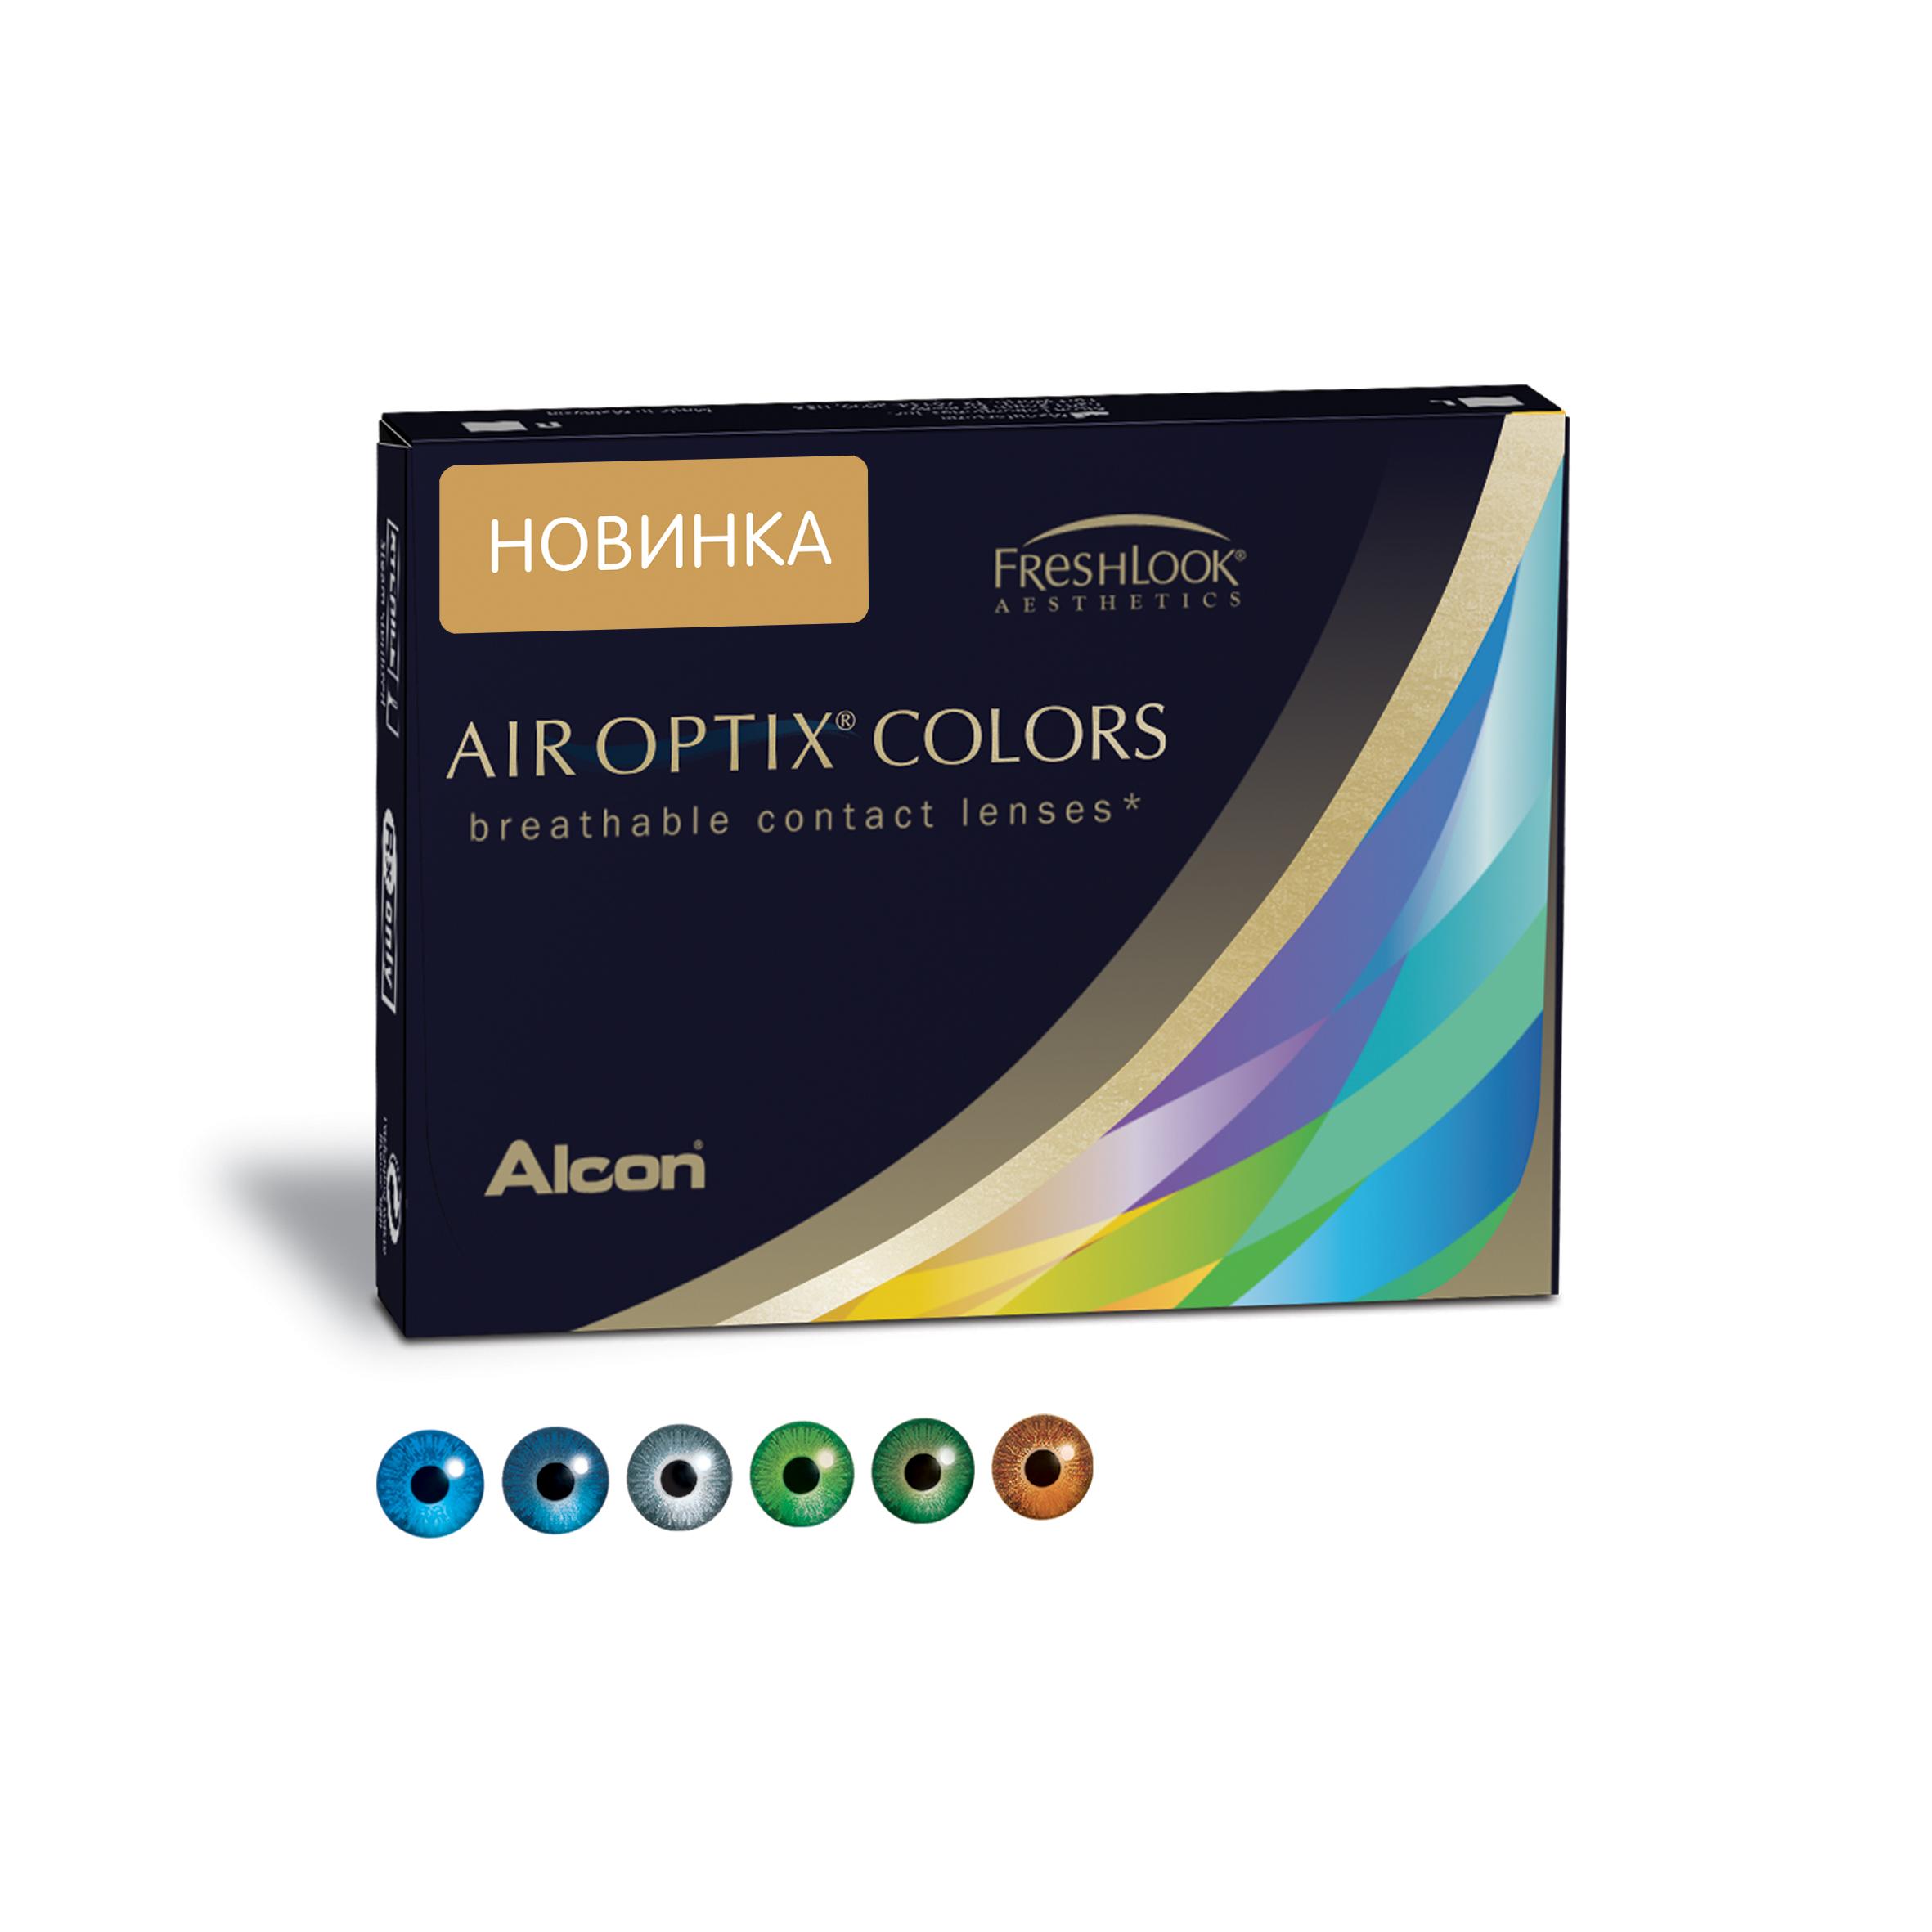 Аlcon контактные линзы Air Optix Colors 2 шт -0.75 Gemstone Green31746115Мягкие контактные линзы